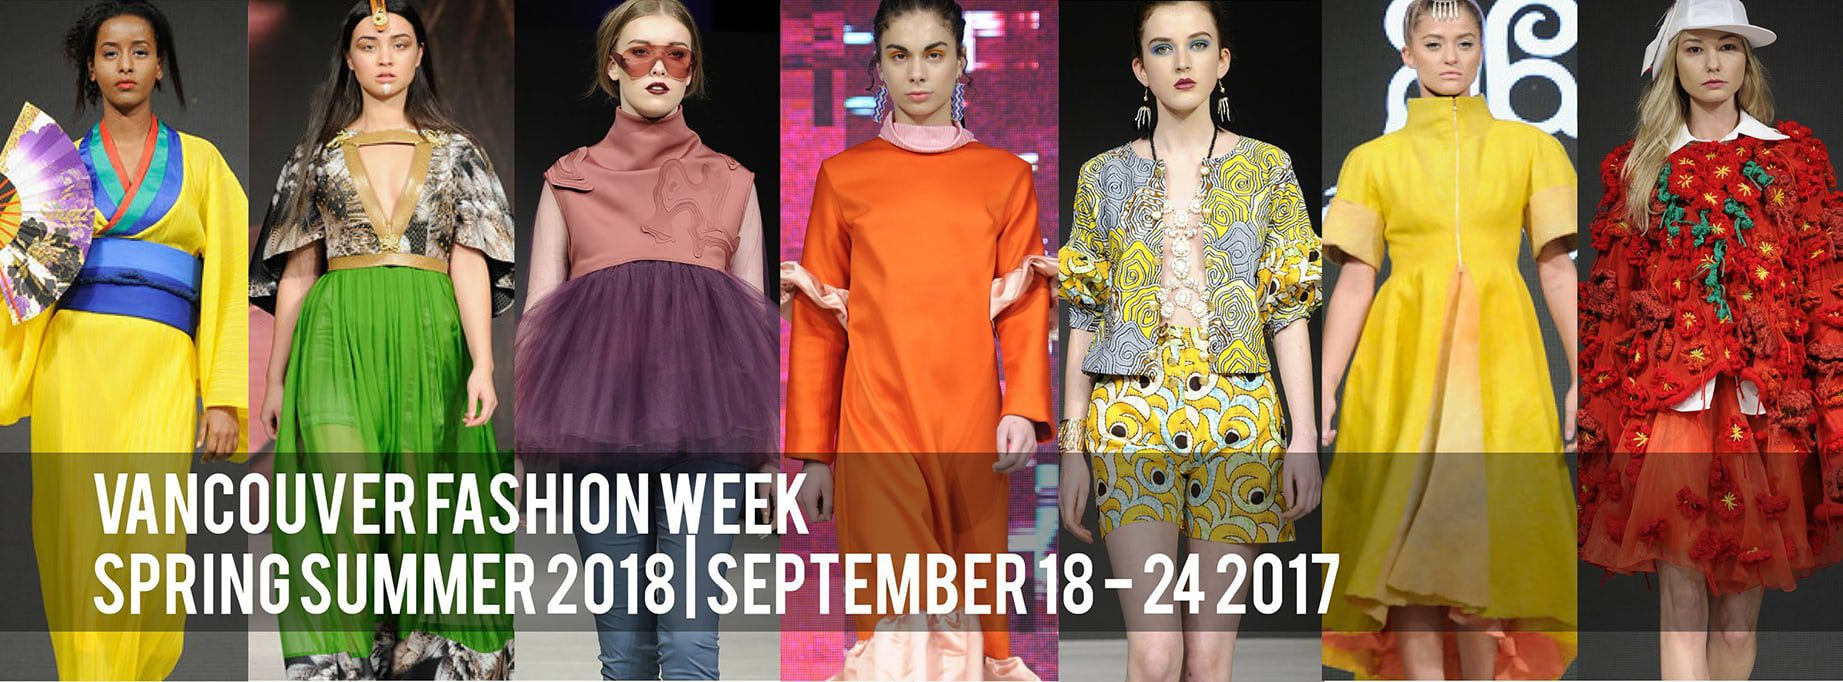 VANCOUVER Fashion Week di Runway Rivista